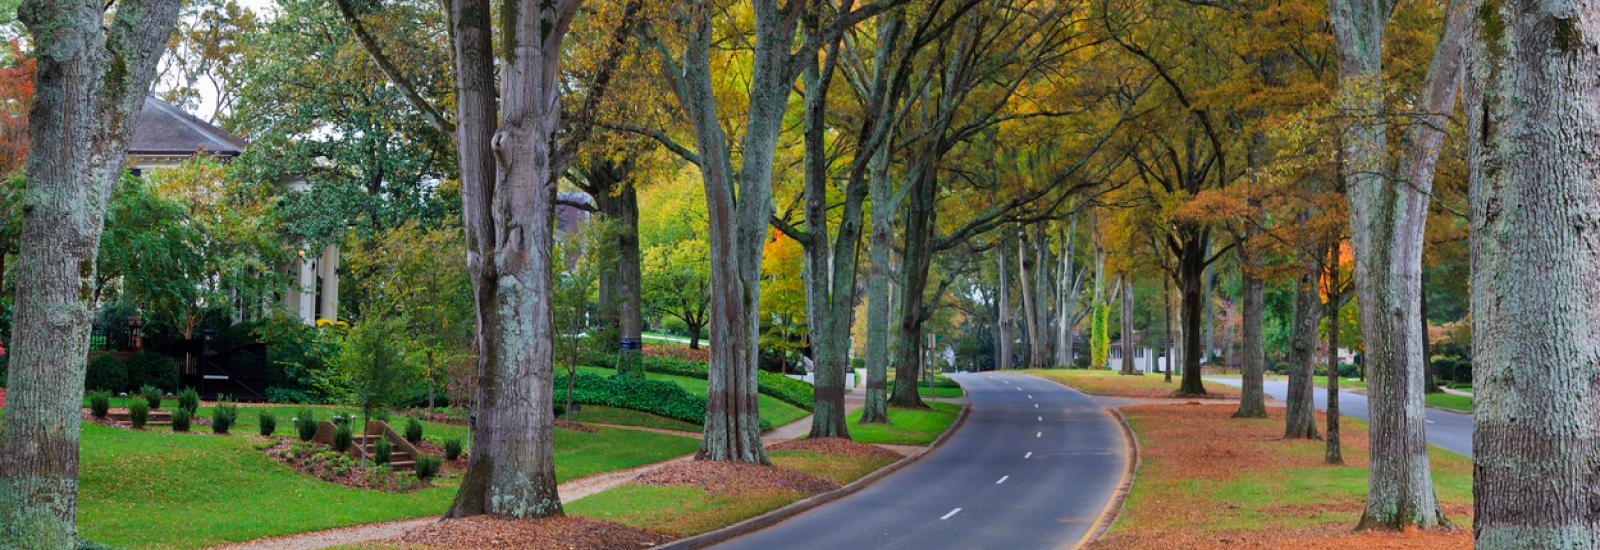 Where Should I Live Near Camp Lejeune North Carolina